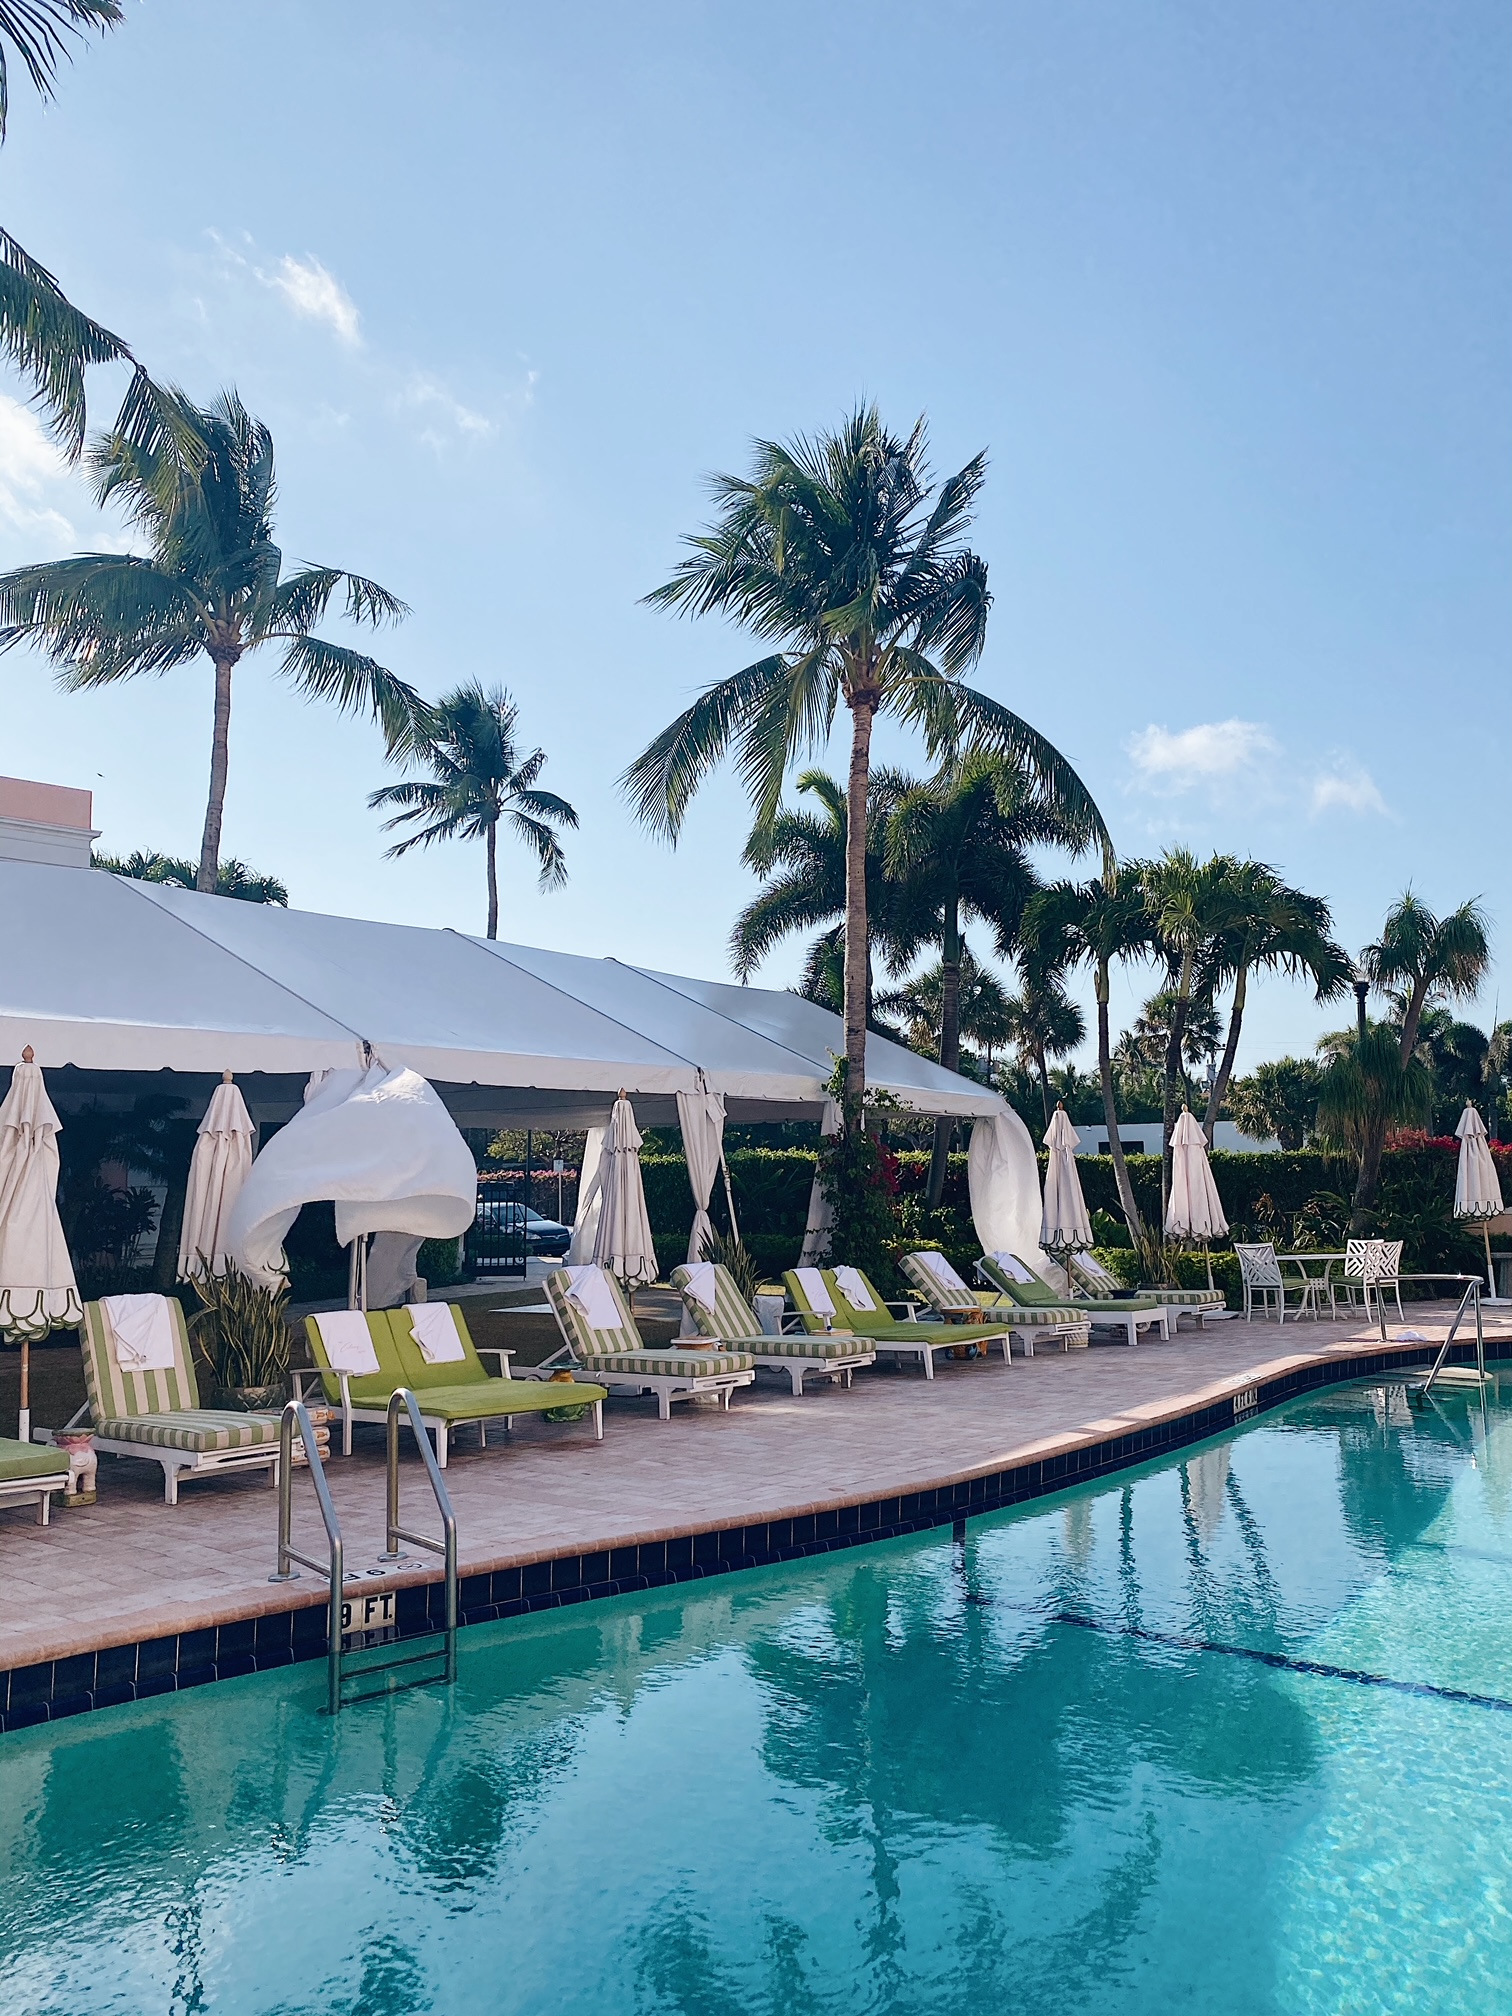 THE COLONY HOTEL // PALM BEACH, FLORIDA